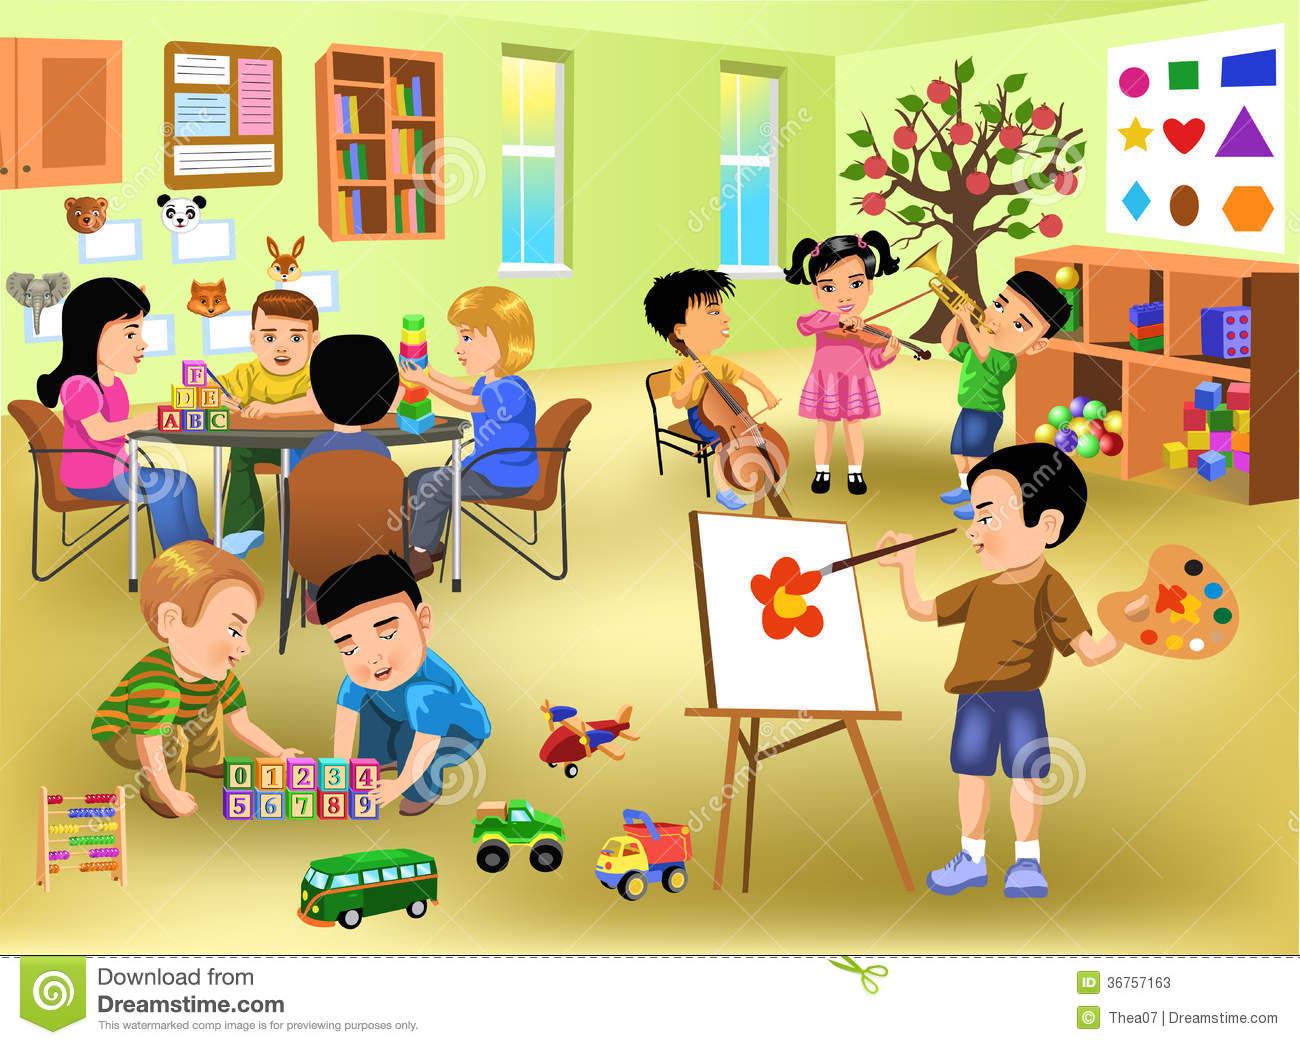 Fun classroom clipart banner freeuse 20+ Classroom Clipart | ClipartLook banner freeuse